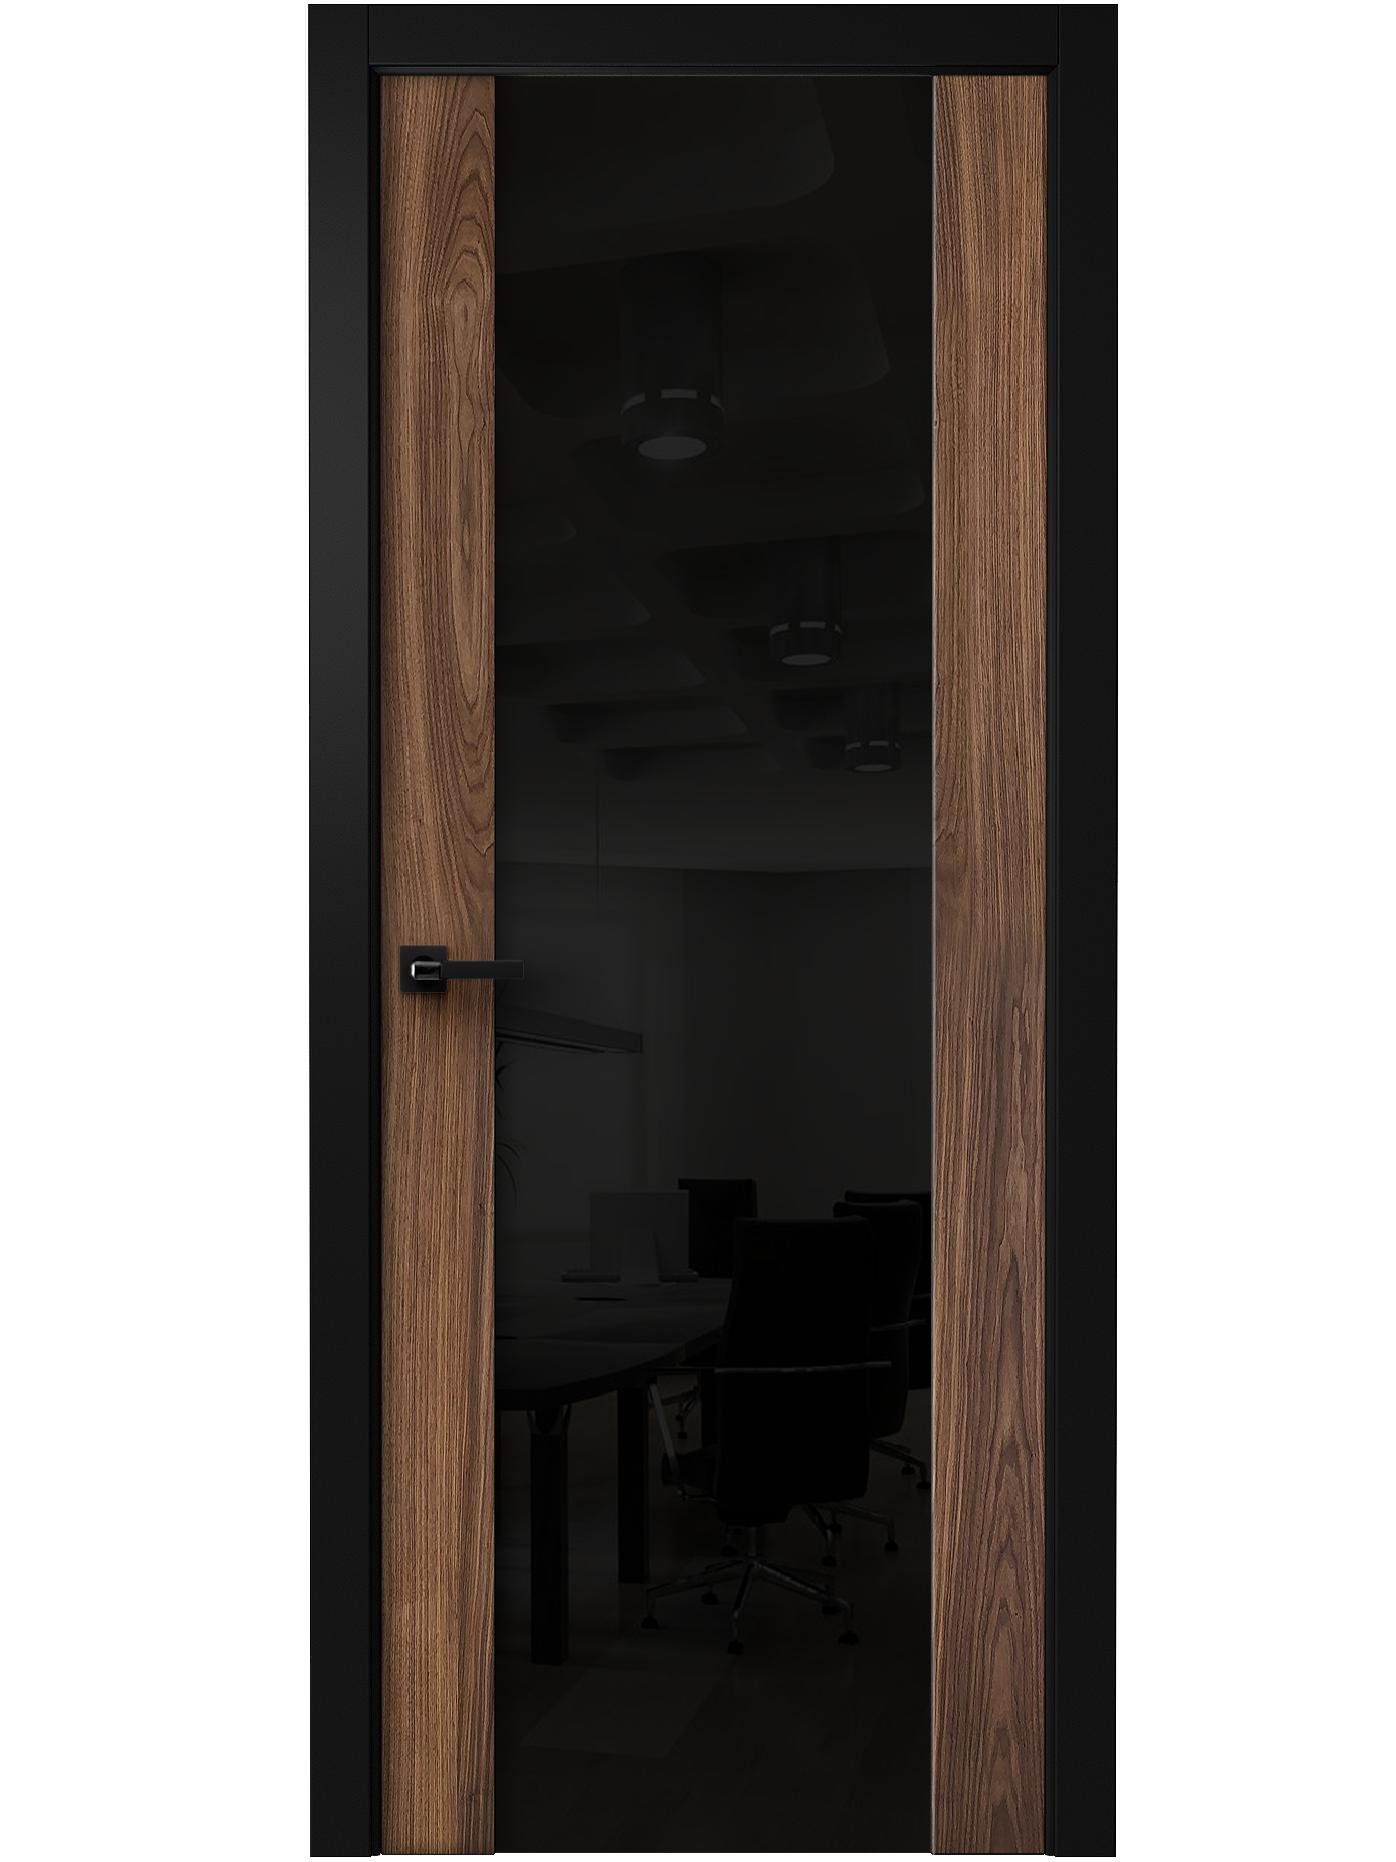 Image Vento Interior Door American Walnut/ Black Triplex Glass 0